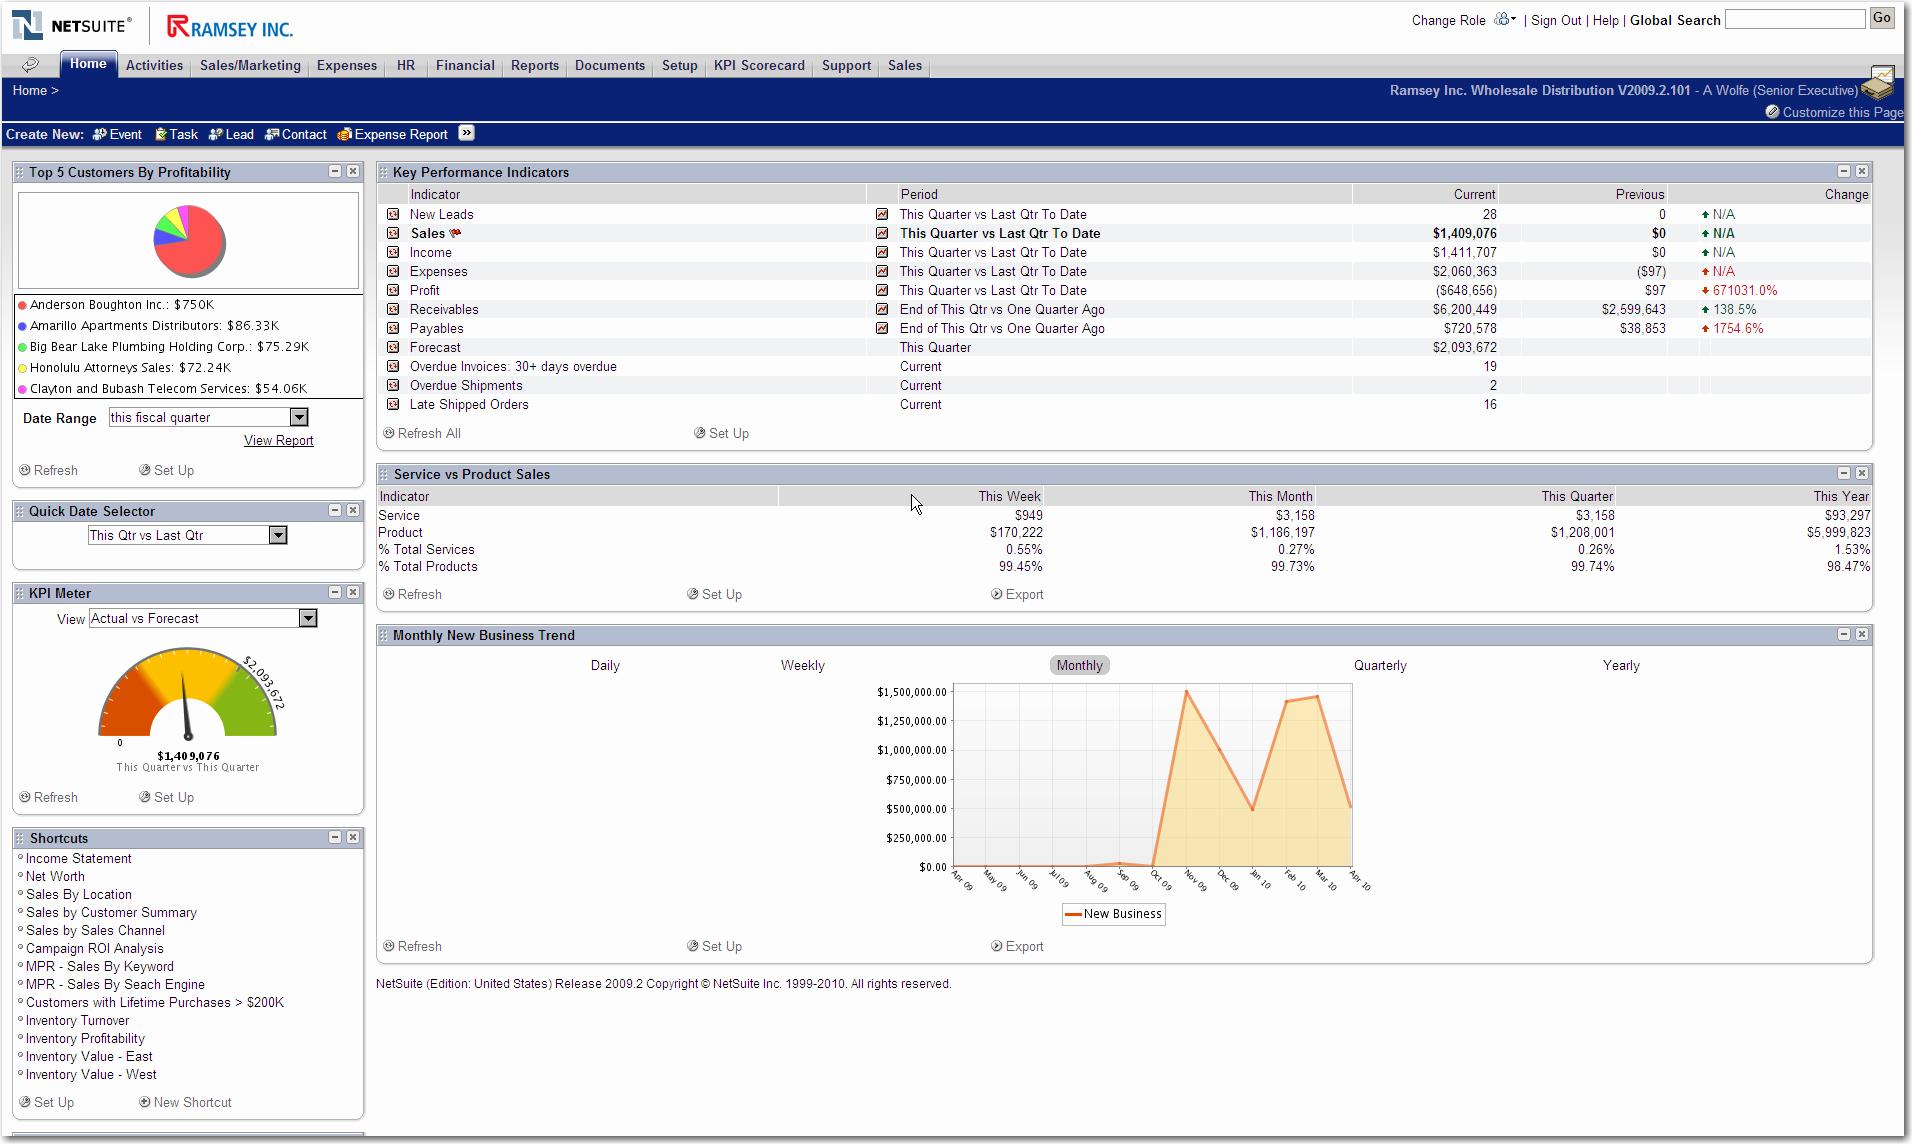 NetSuite - Senior Executive Dashboard